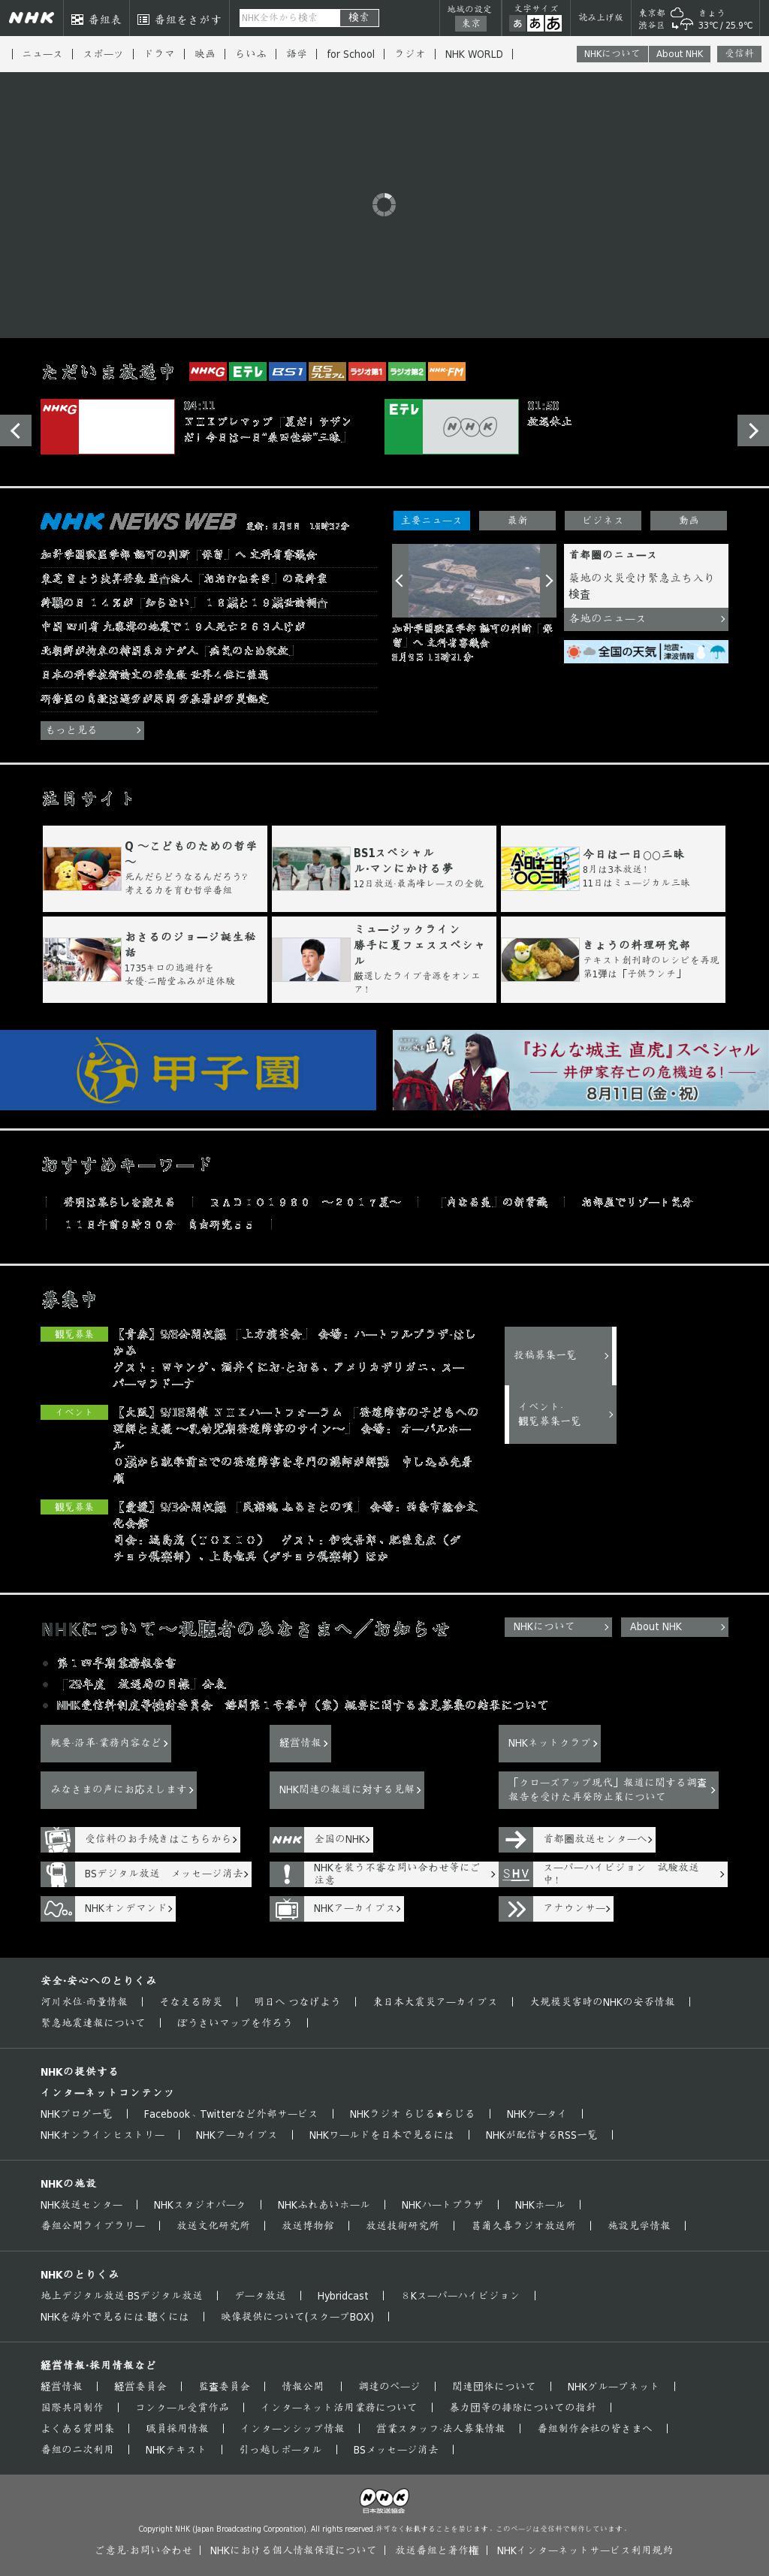 NHK Online at Wednesday Aug. 9, 2017, 7:14 p.m. UTC